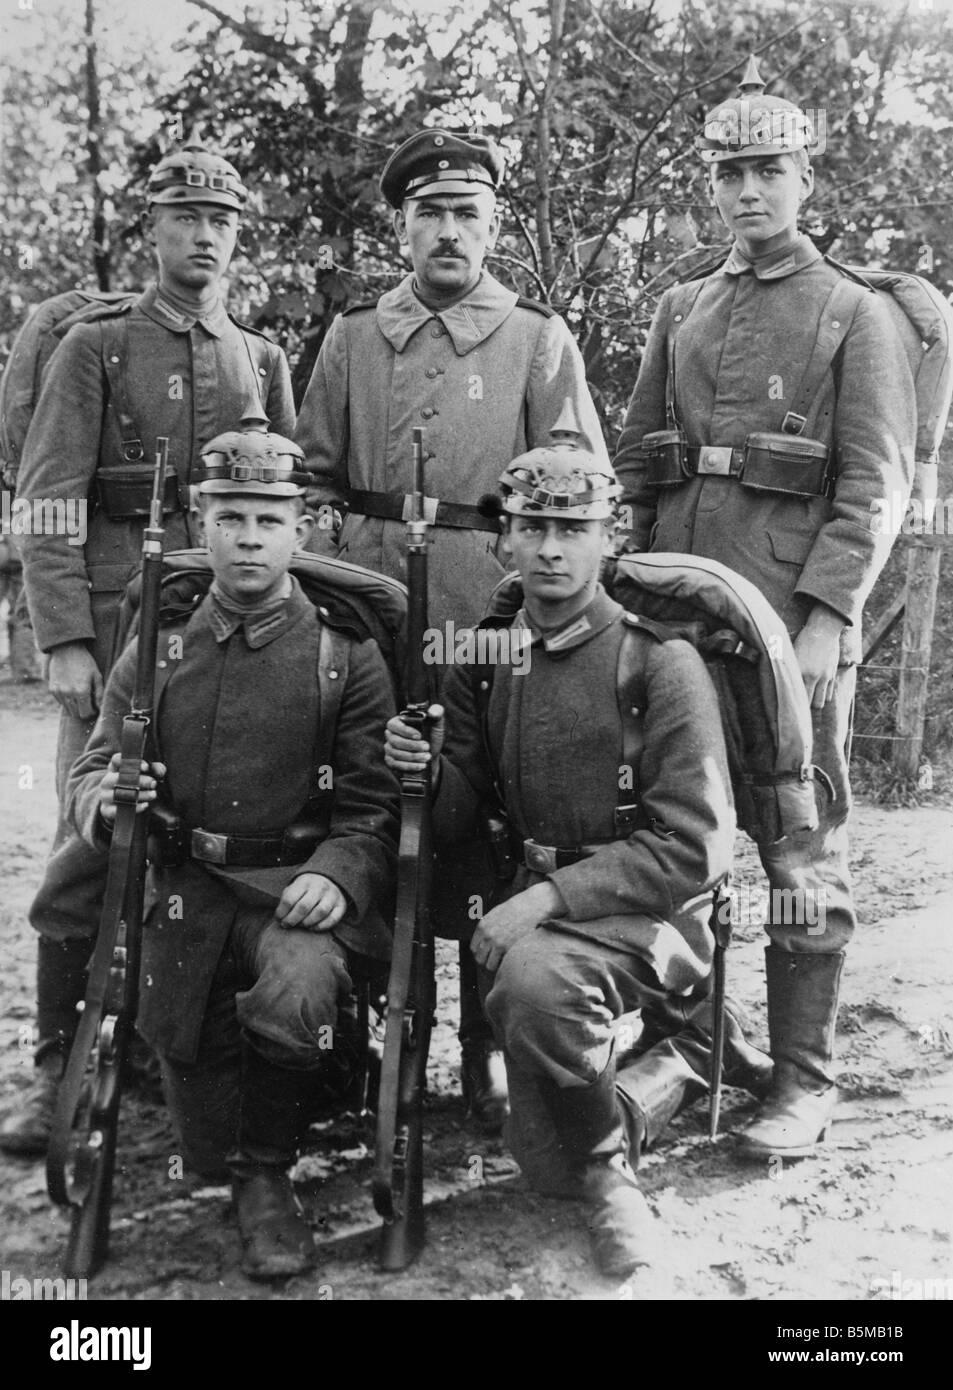 2 M73 S2 1914 1 Ger infantrymen Group photo c 1914 Military German army soldiers Group photo of five infantrymen - Stock Image